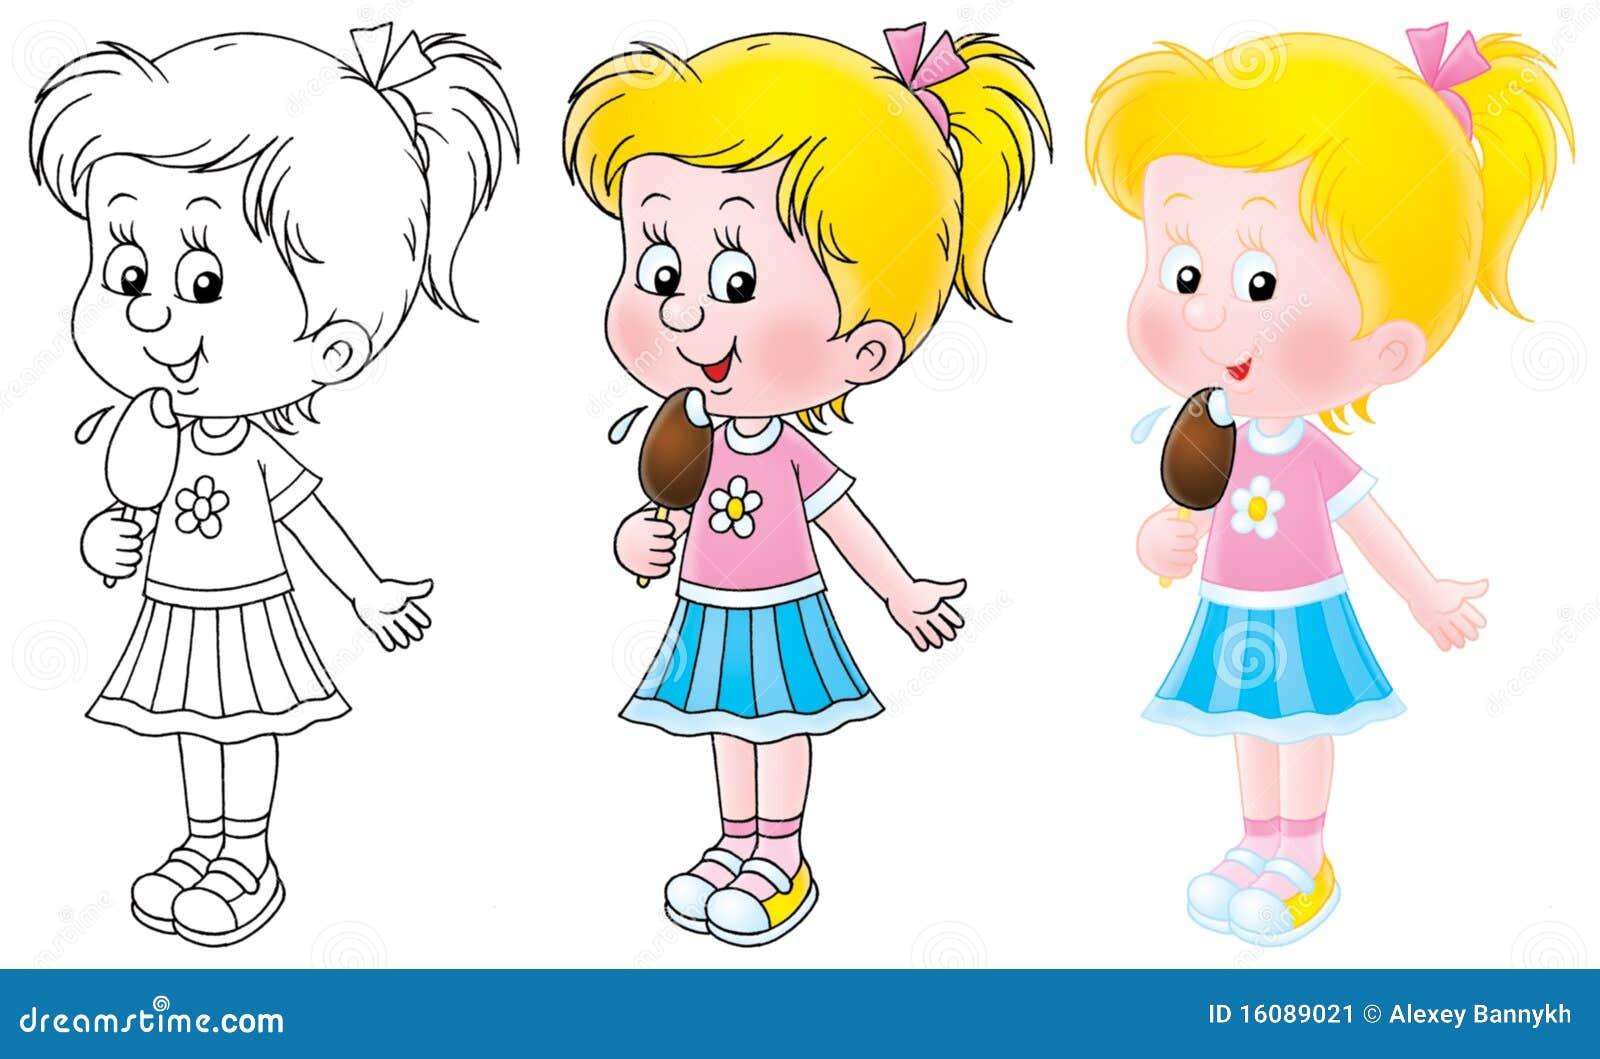 Девочка ест морожено рисунок